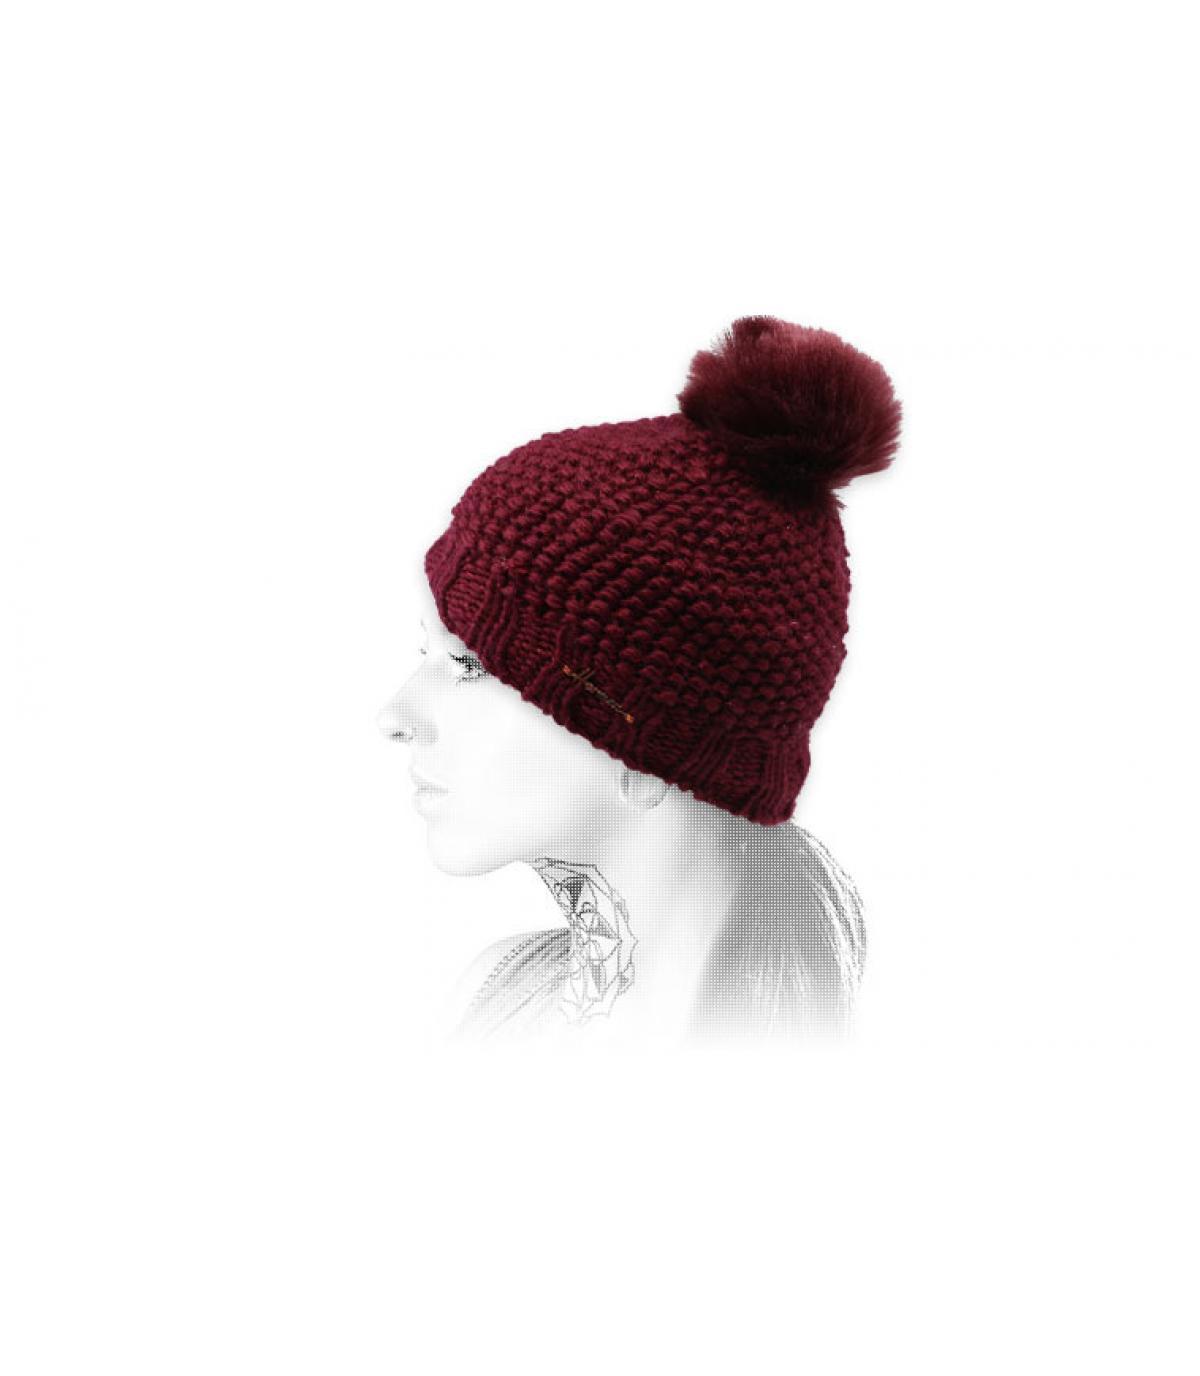 Bommel Mütze bordeaux Lurex